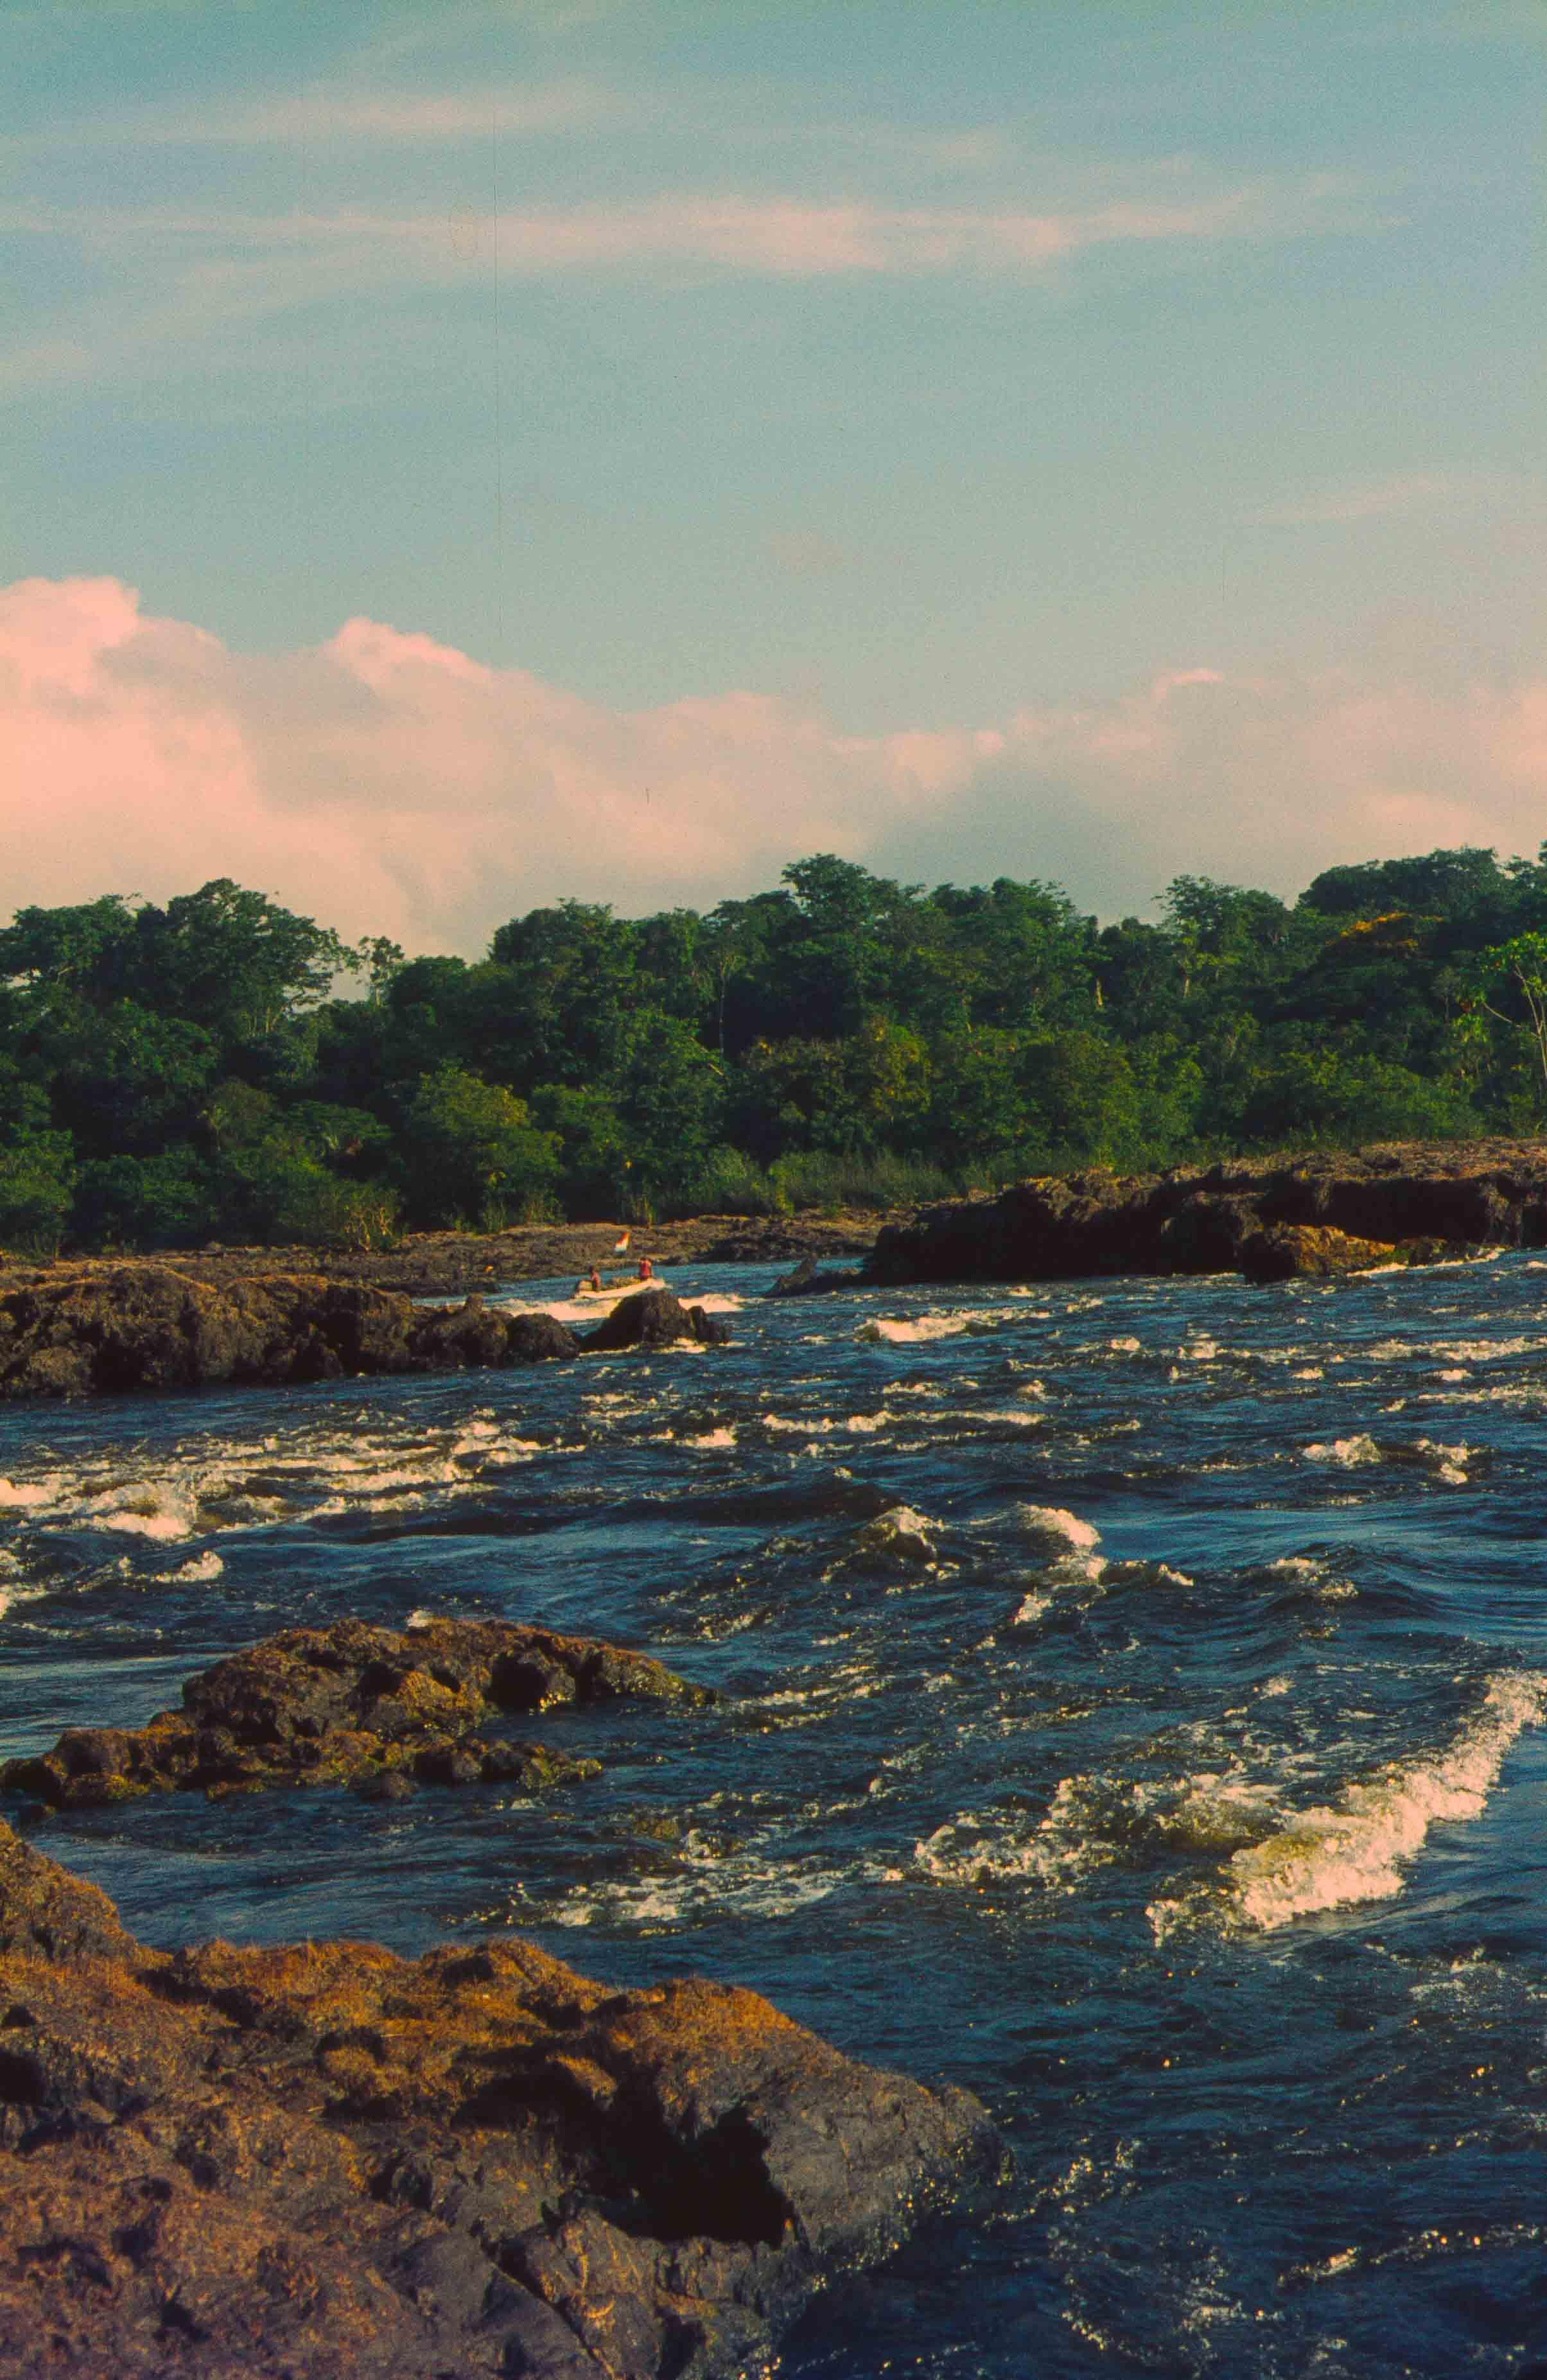 467. Suriname